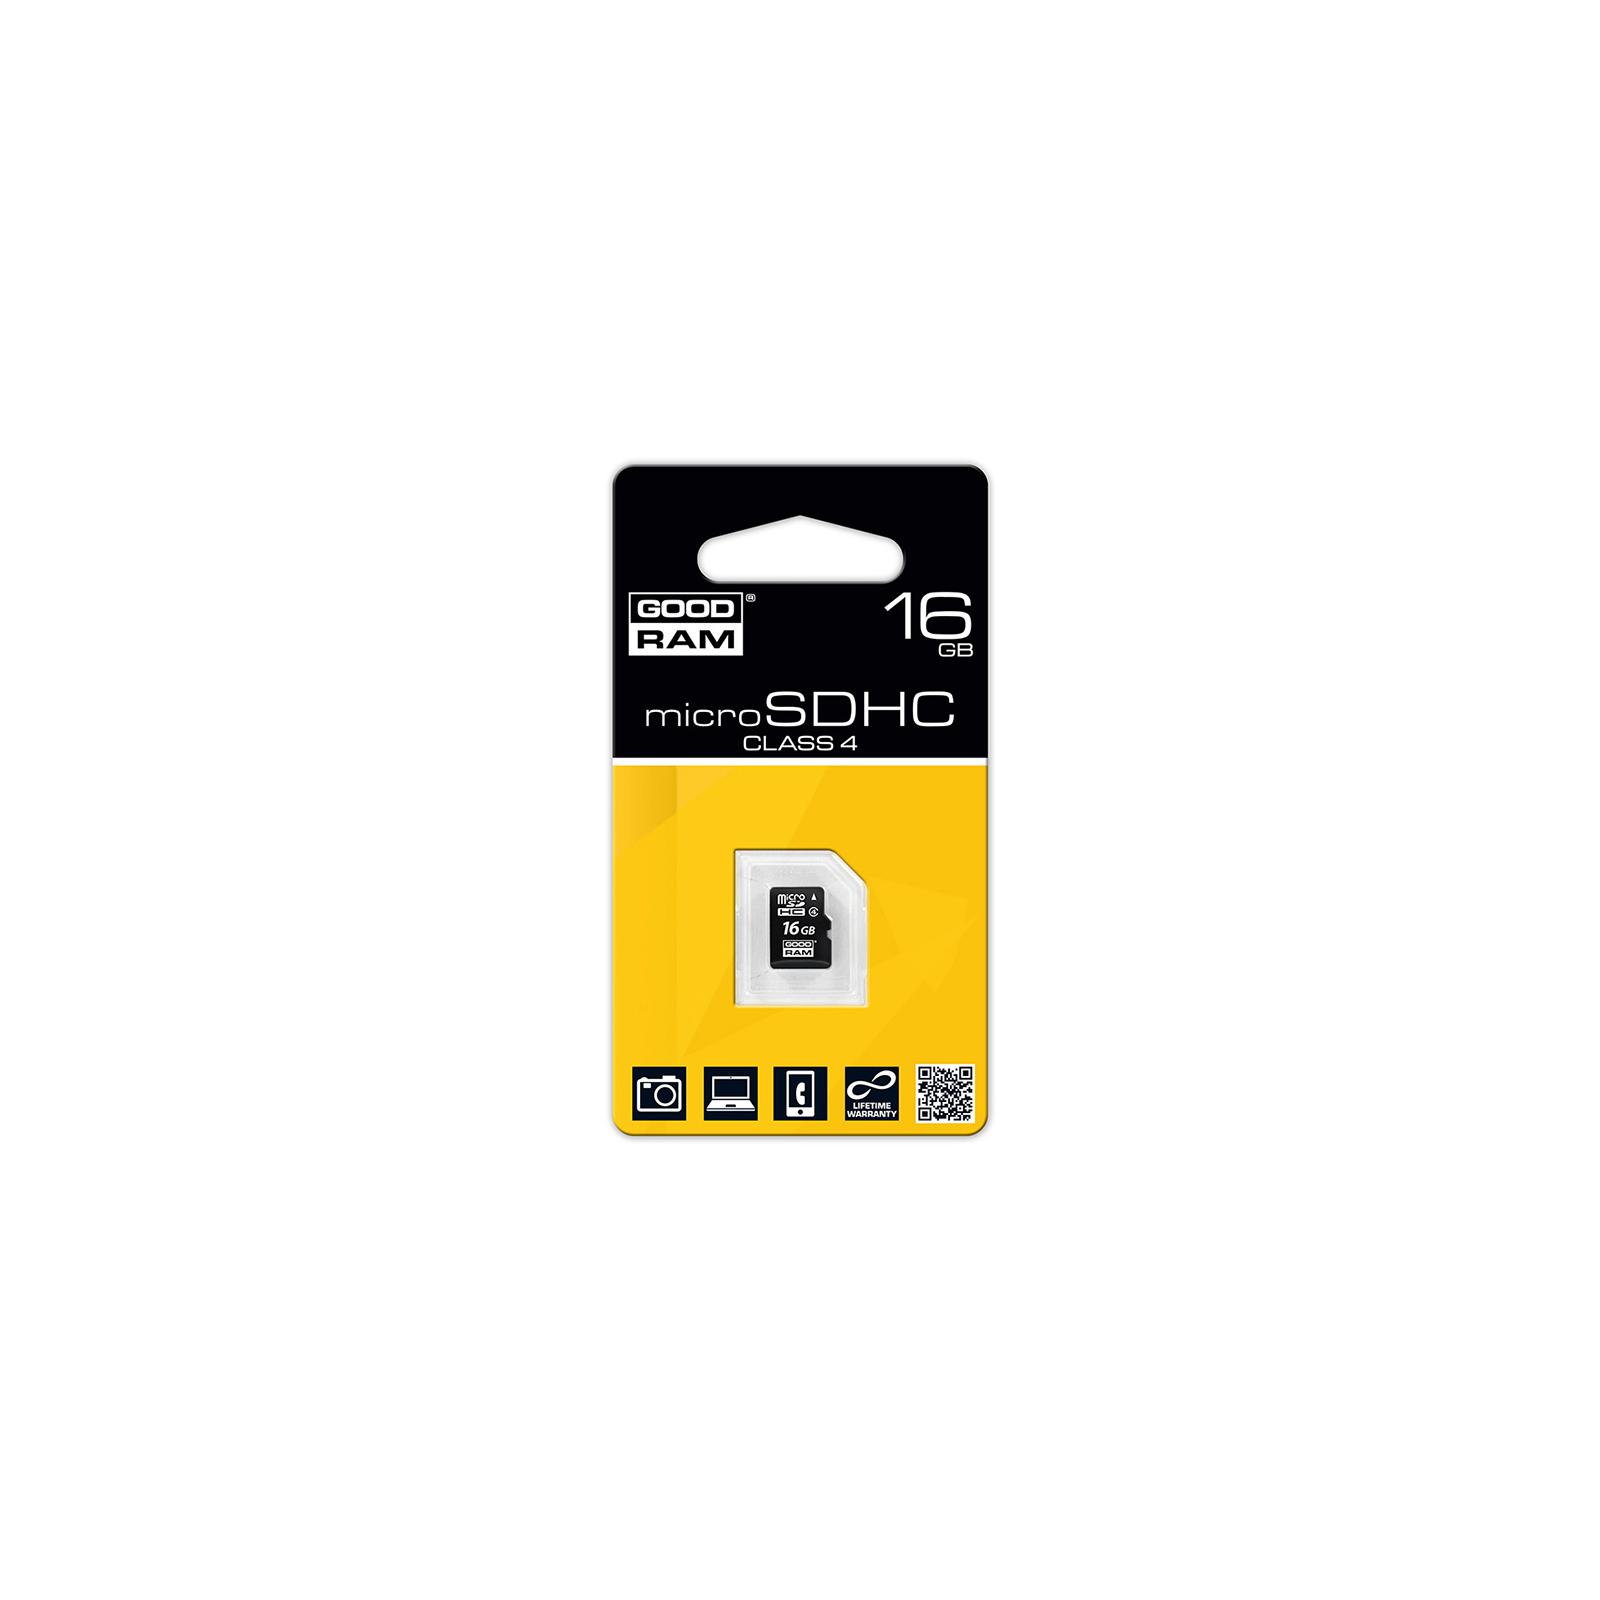 Карта памяти GOODRAM 16GB microSDHC Class 4 (SDU16GHCGRR10) изображение 2